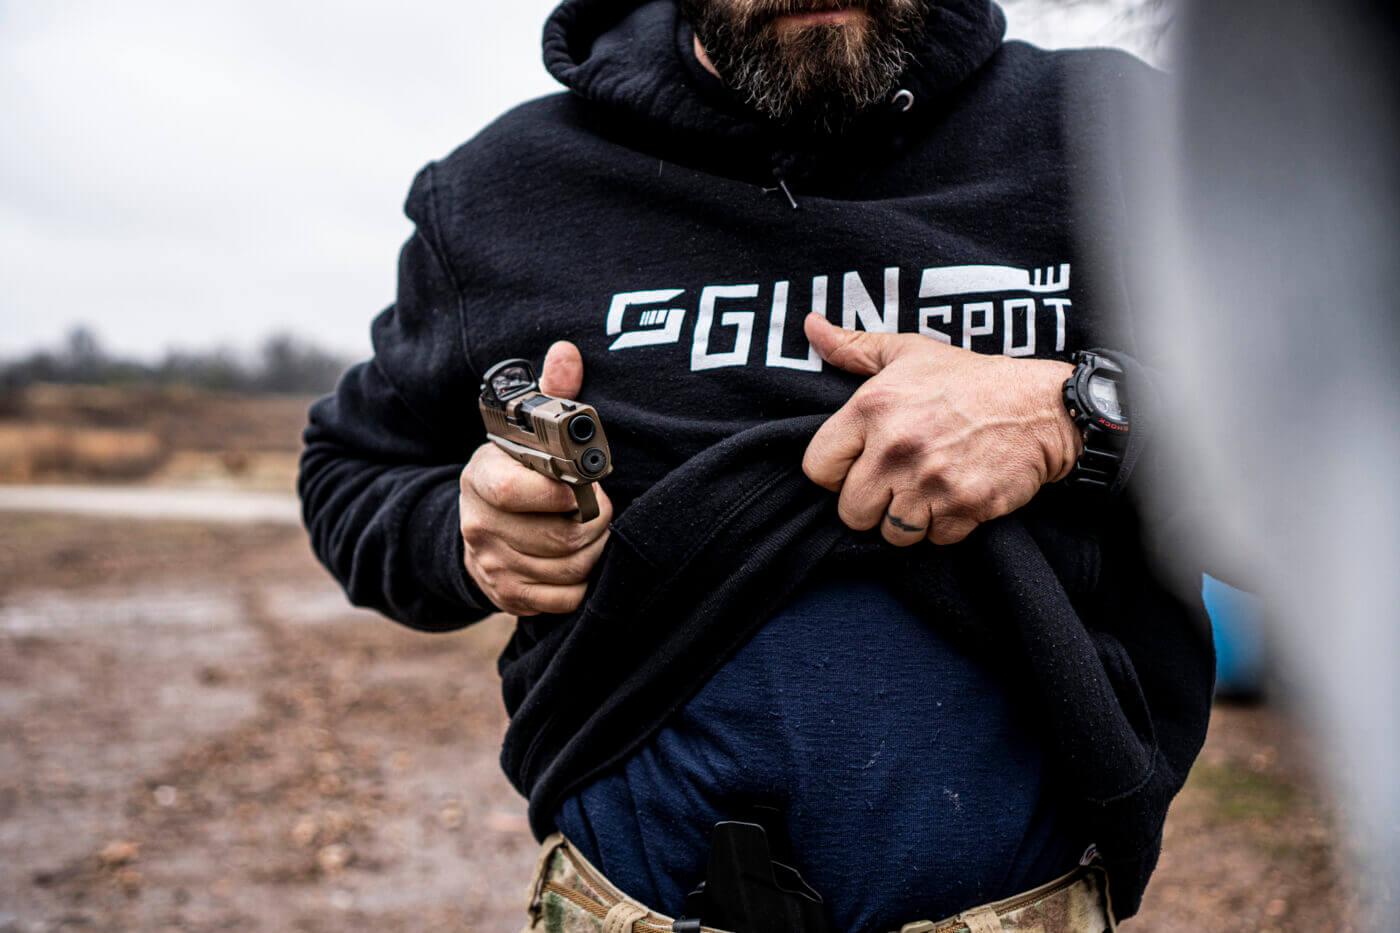 Man rotating the gun to the target